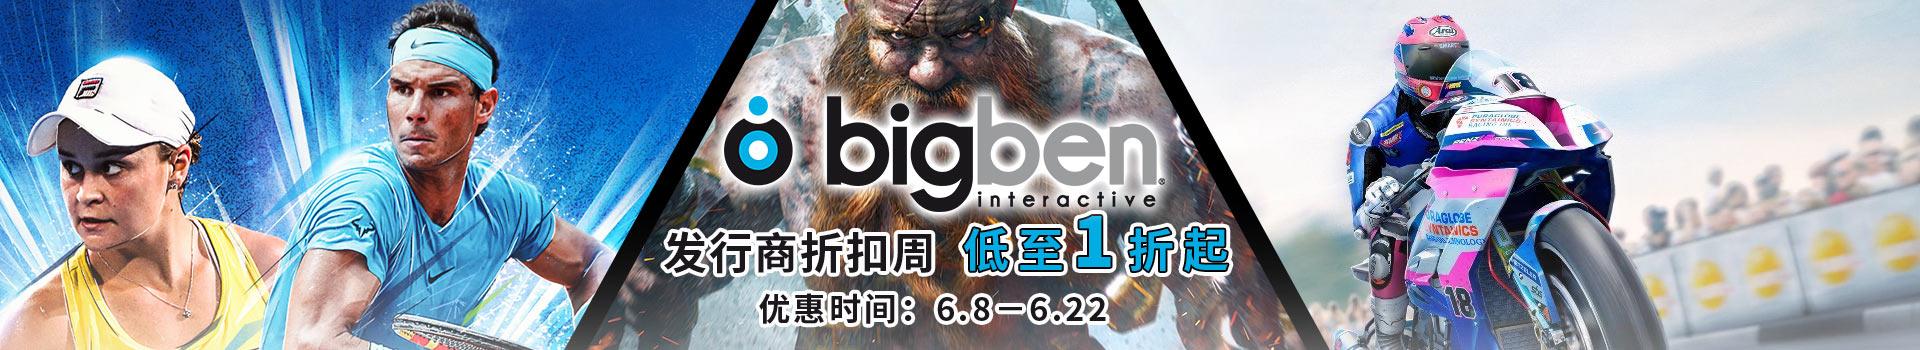 Bigben��琛������e�� 浣���1��璧�